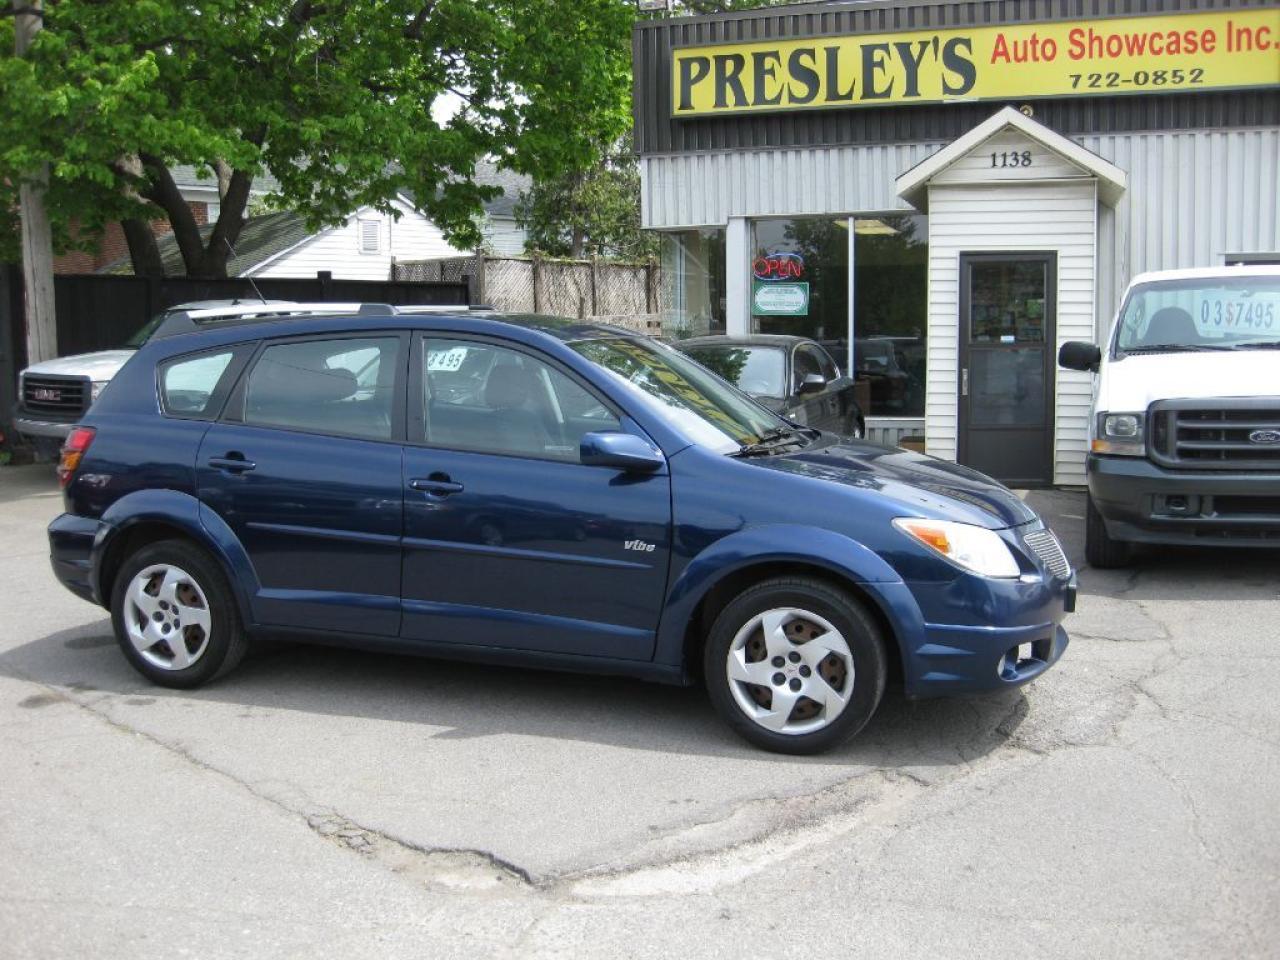 2005 Pontiac Vibe Auto, 4cyl, p/w p/l, a/c, keyless entry, cruise